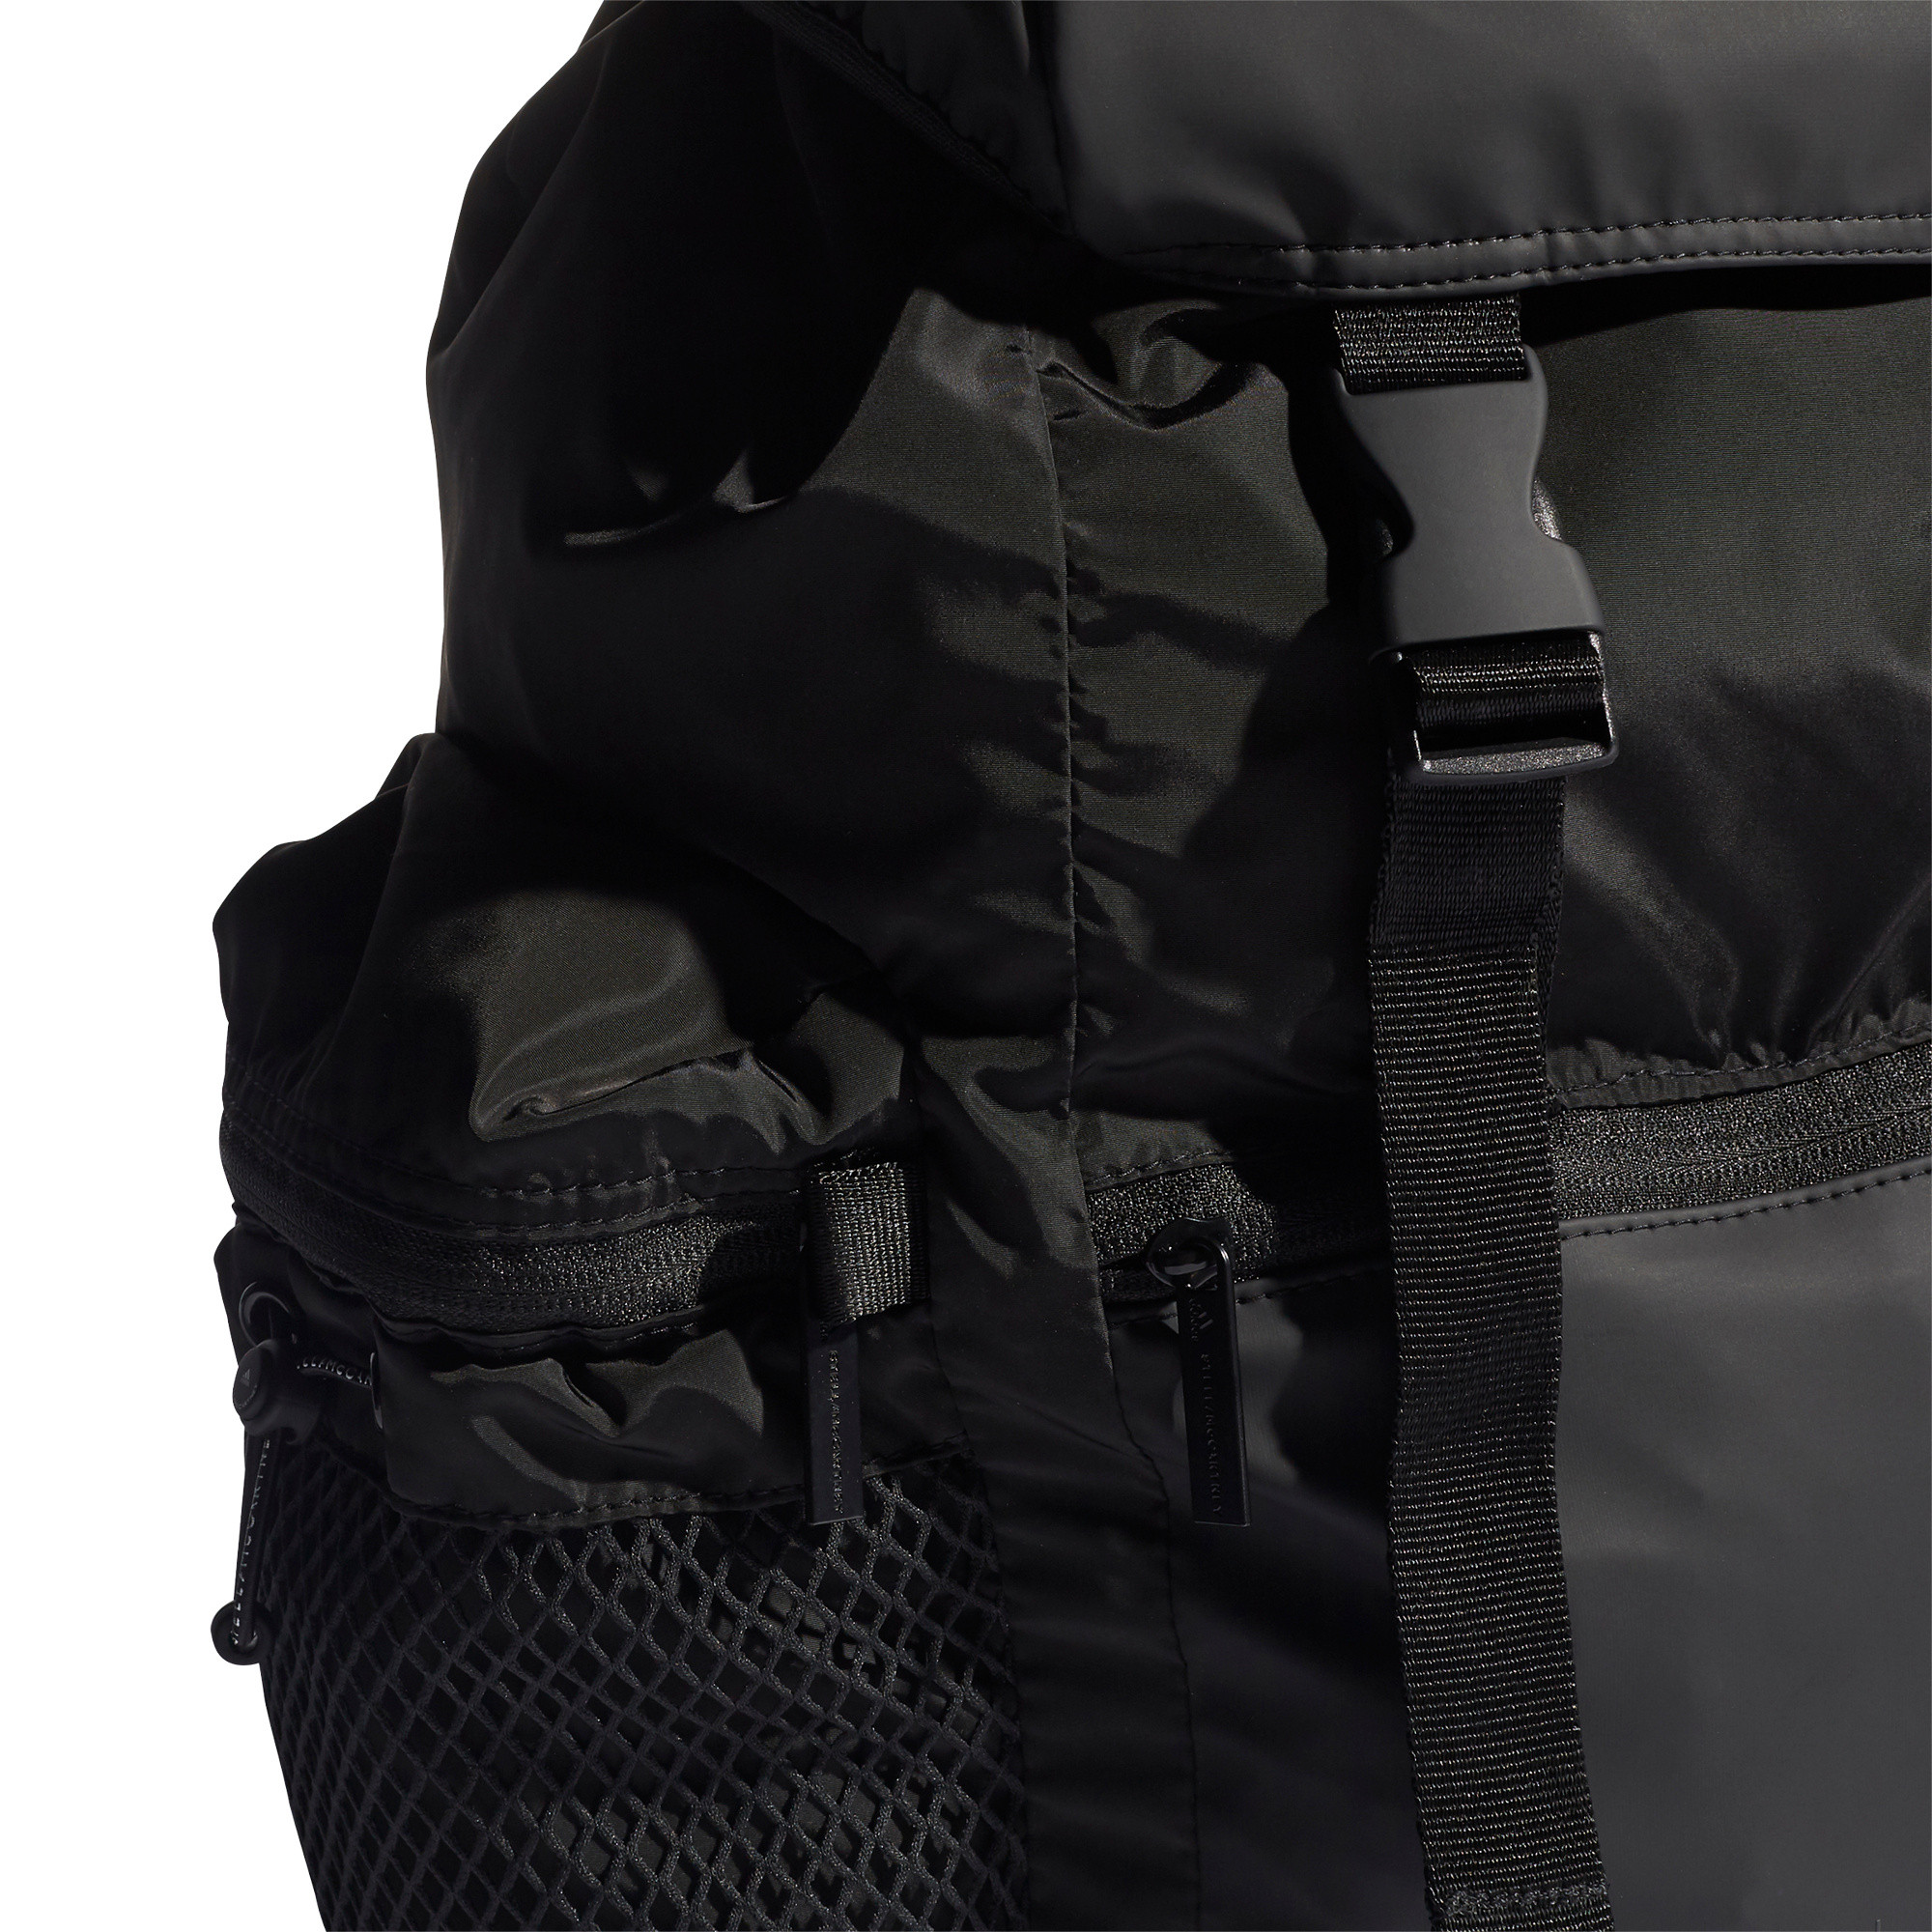 Zaino Asmc Backpack, Nero, large image number 5